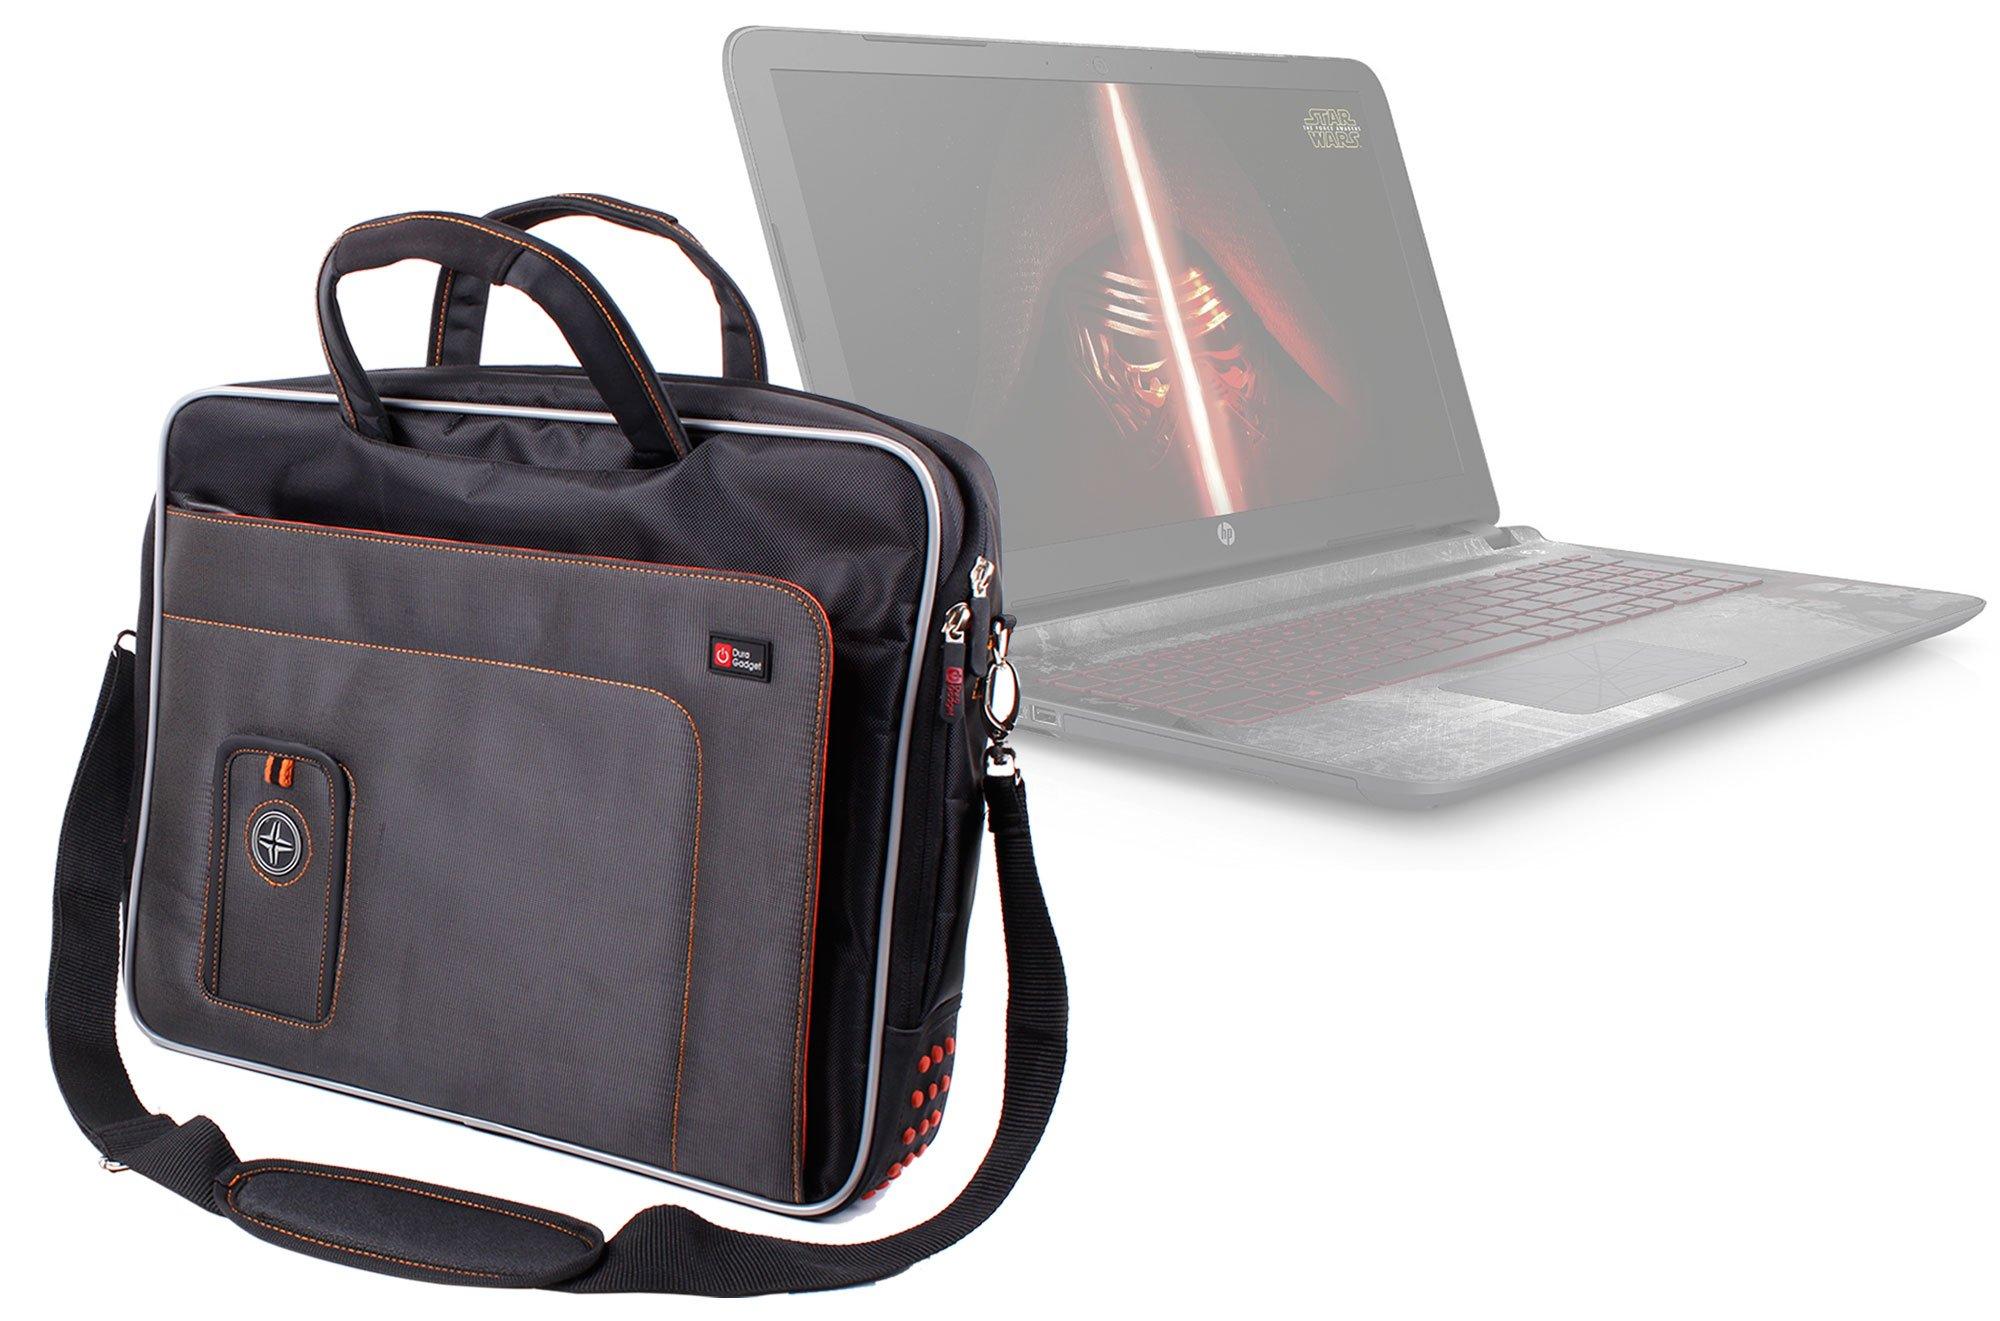 Caja ultra resistente para ordenador Winnovo vanbook V143 y HP Stream 14-ax018nf Ultrabook portátil 14